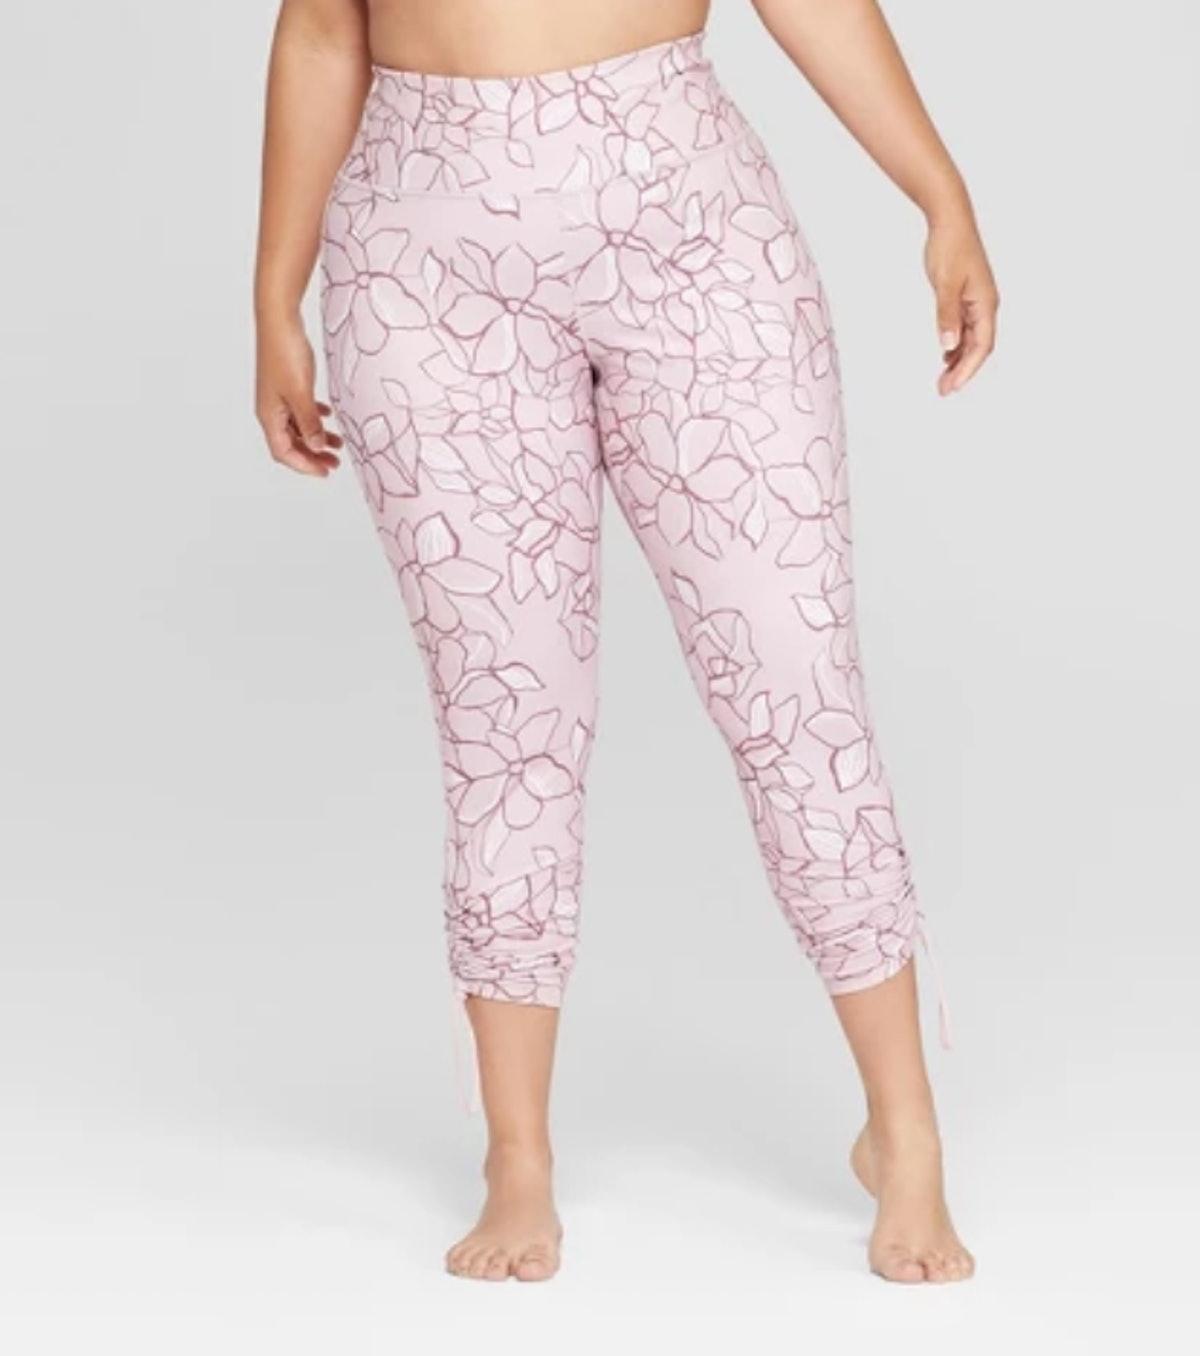 Women's Plus Size Printed Comfort 7/8 High-Waisted Leggings with Adjustable Length - JoyLab